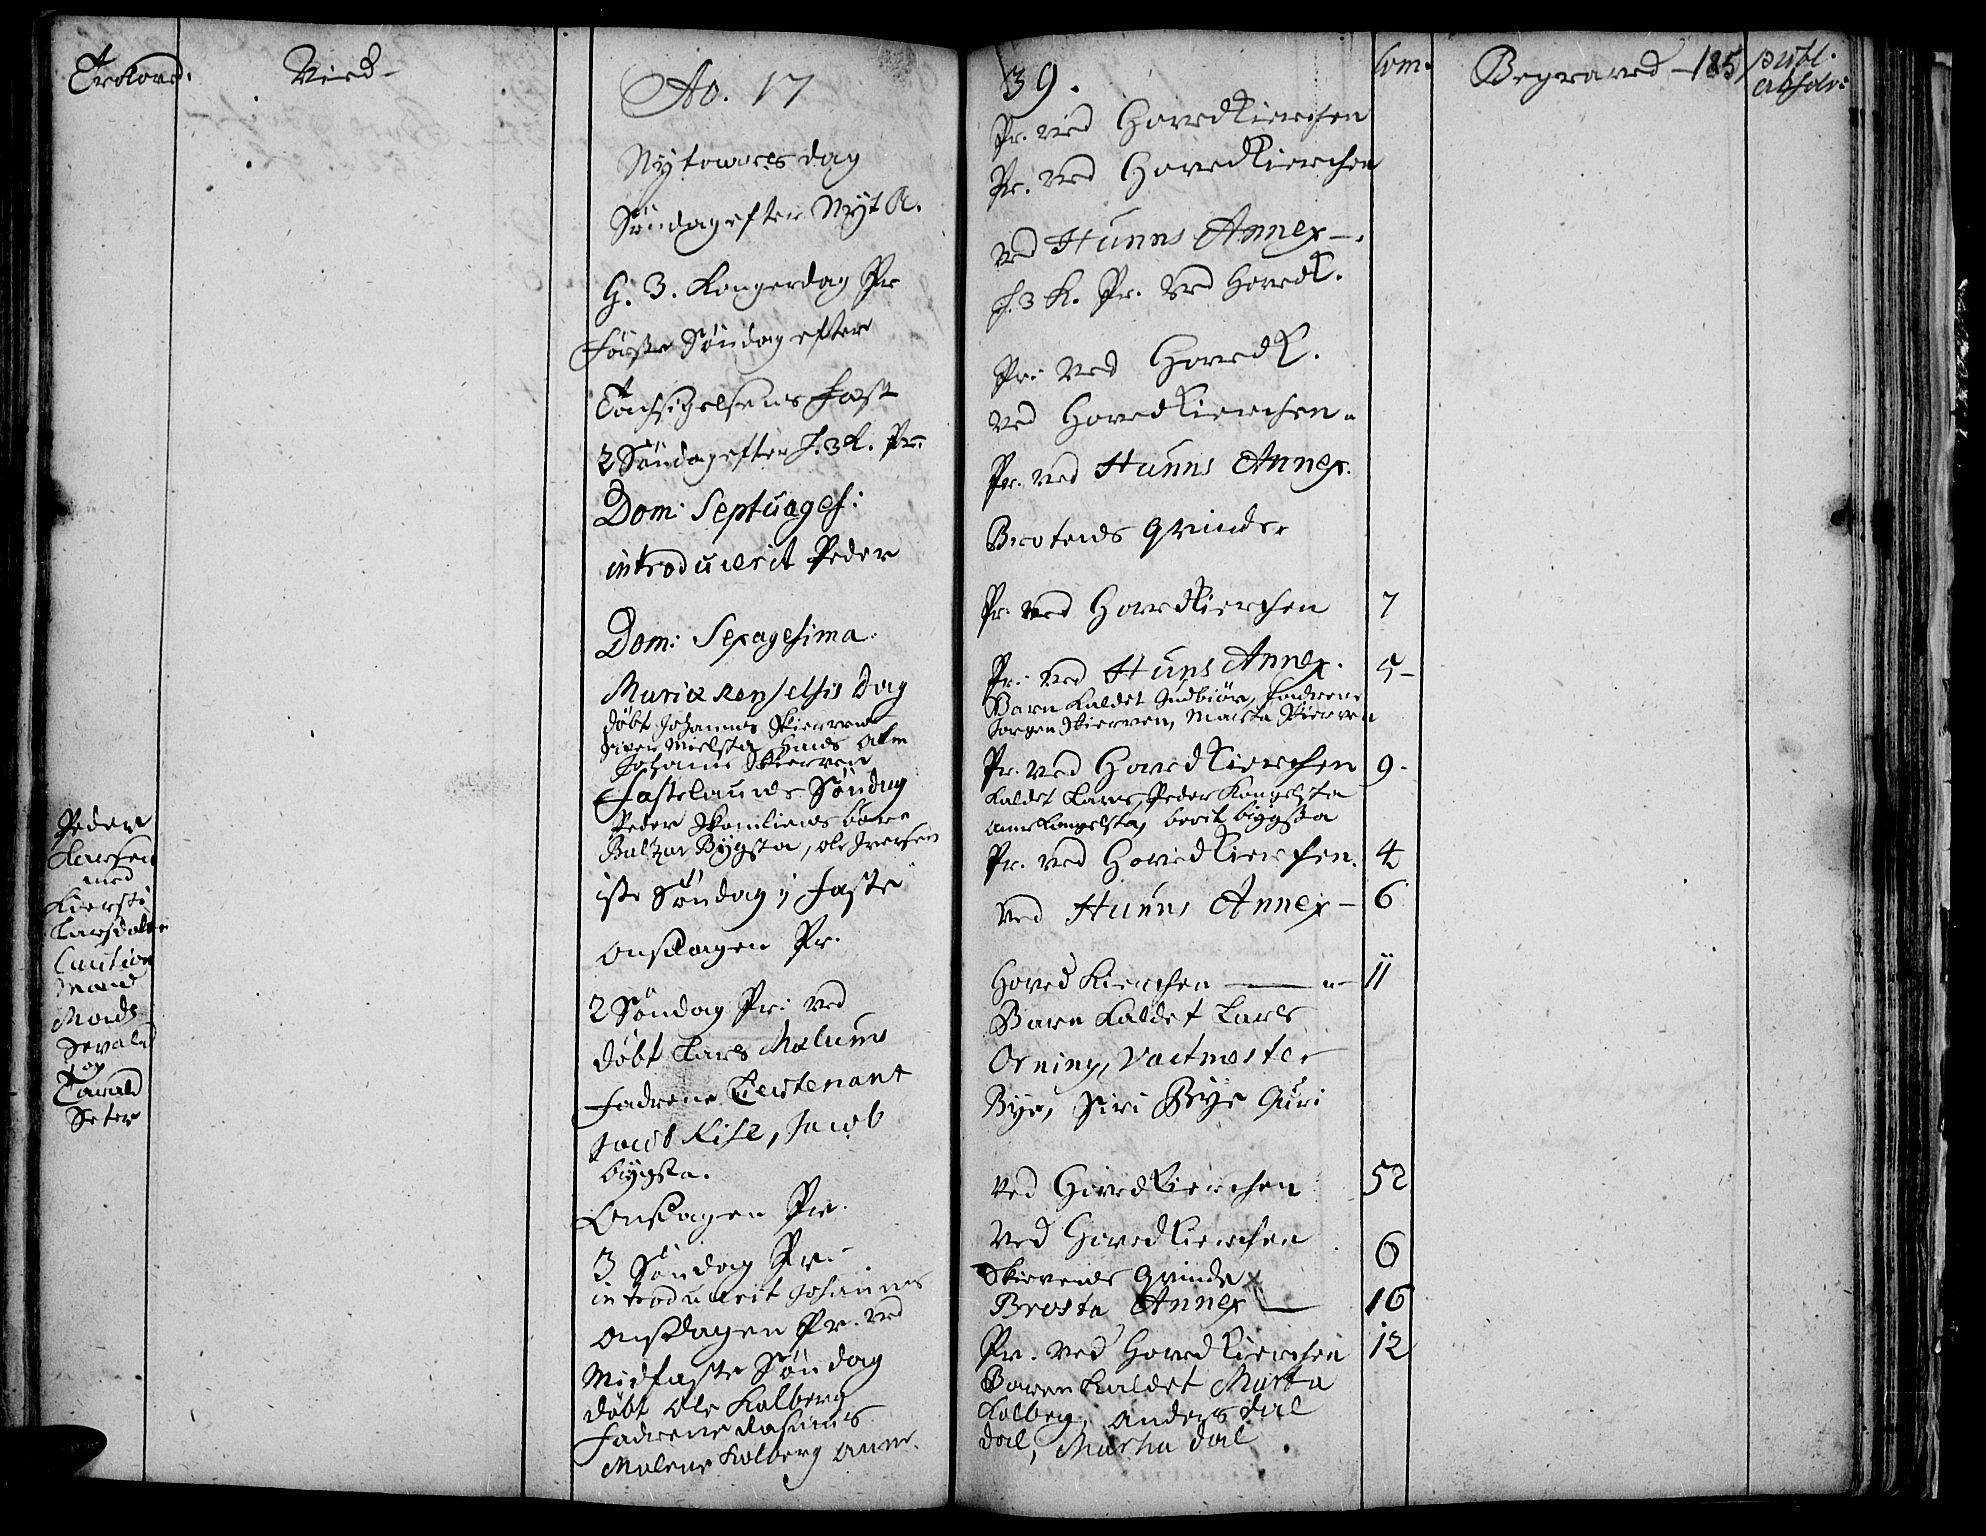 SAH, Vardal prestekontor, H/Ha/Haa/L0001: Ministerialbok nr. 1, 1706-1748, s. 185